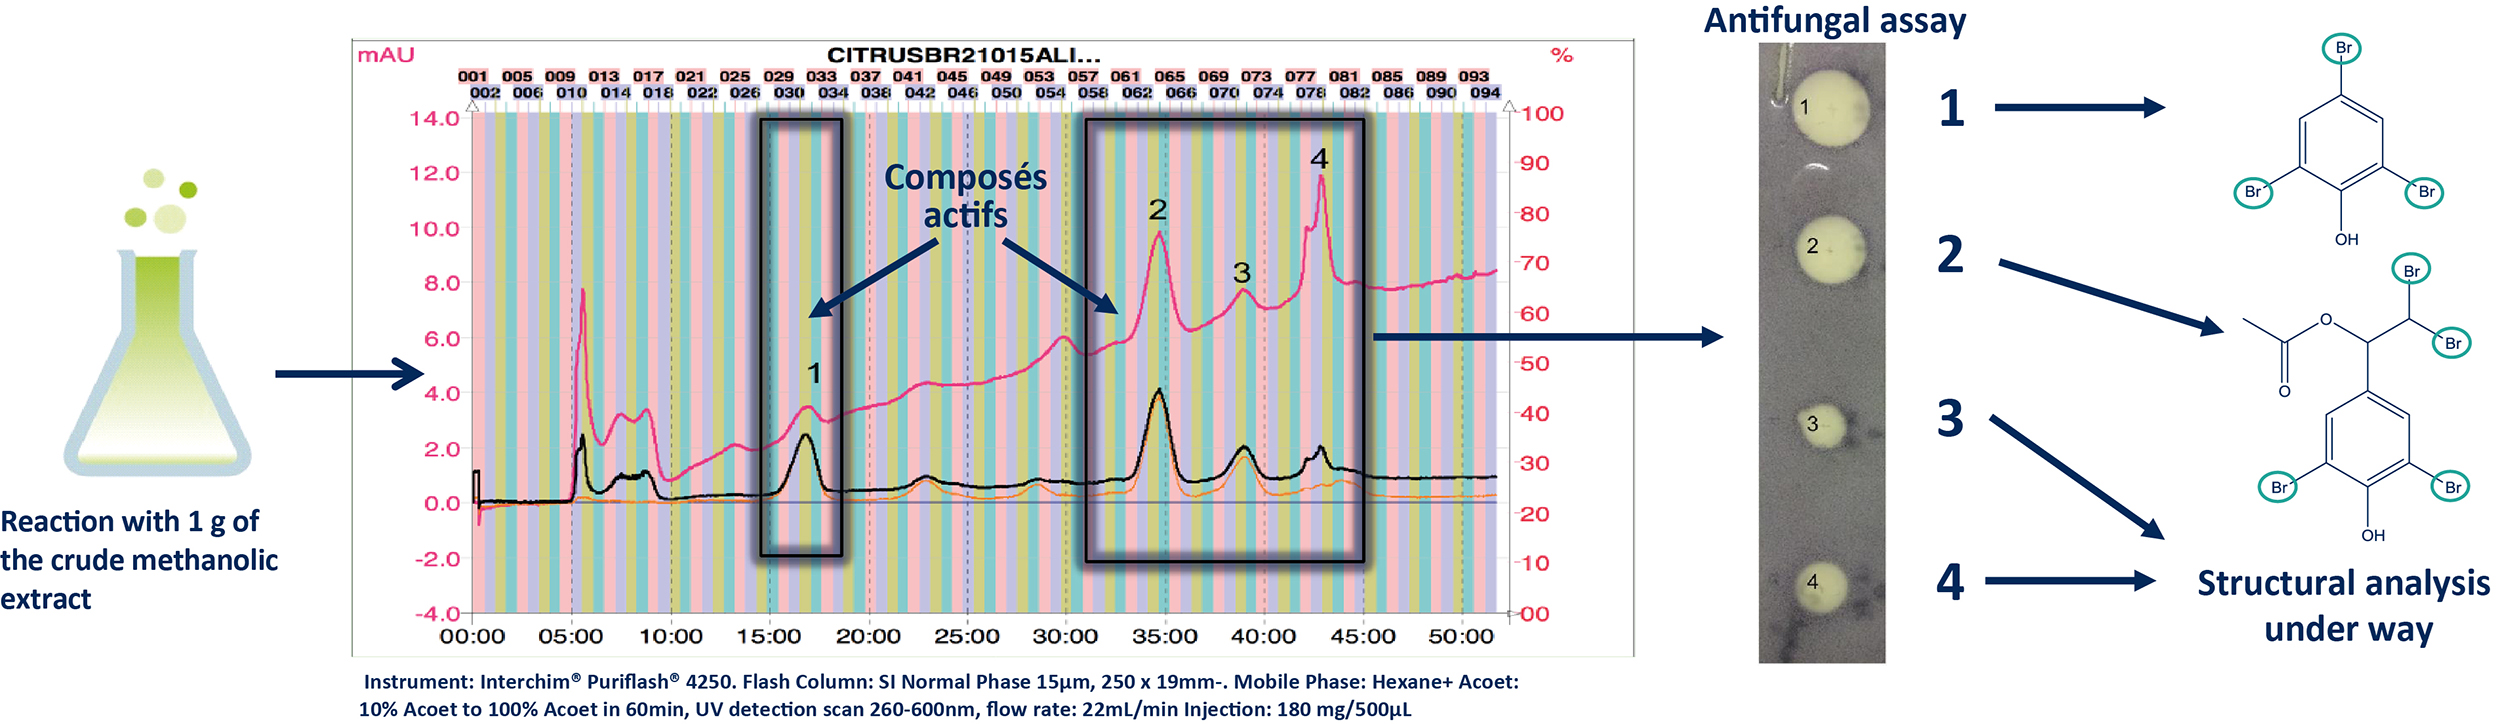 Normal Phase Ultra Pressure Flash Chromatography (FC-UV)